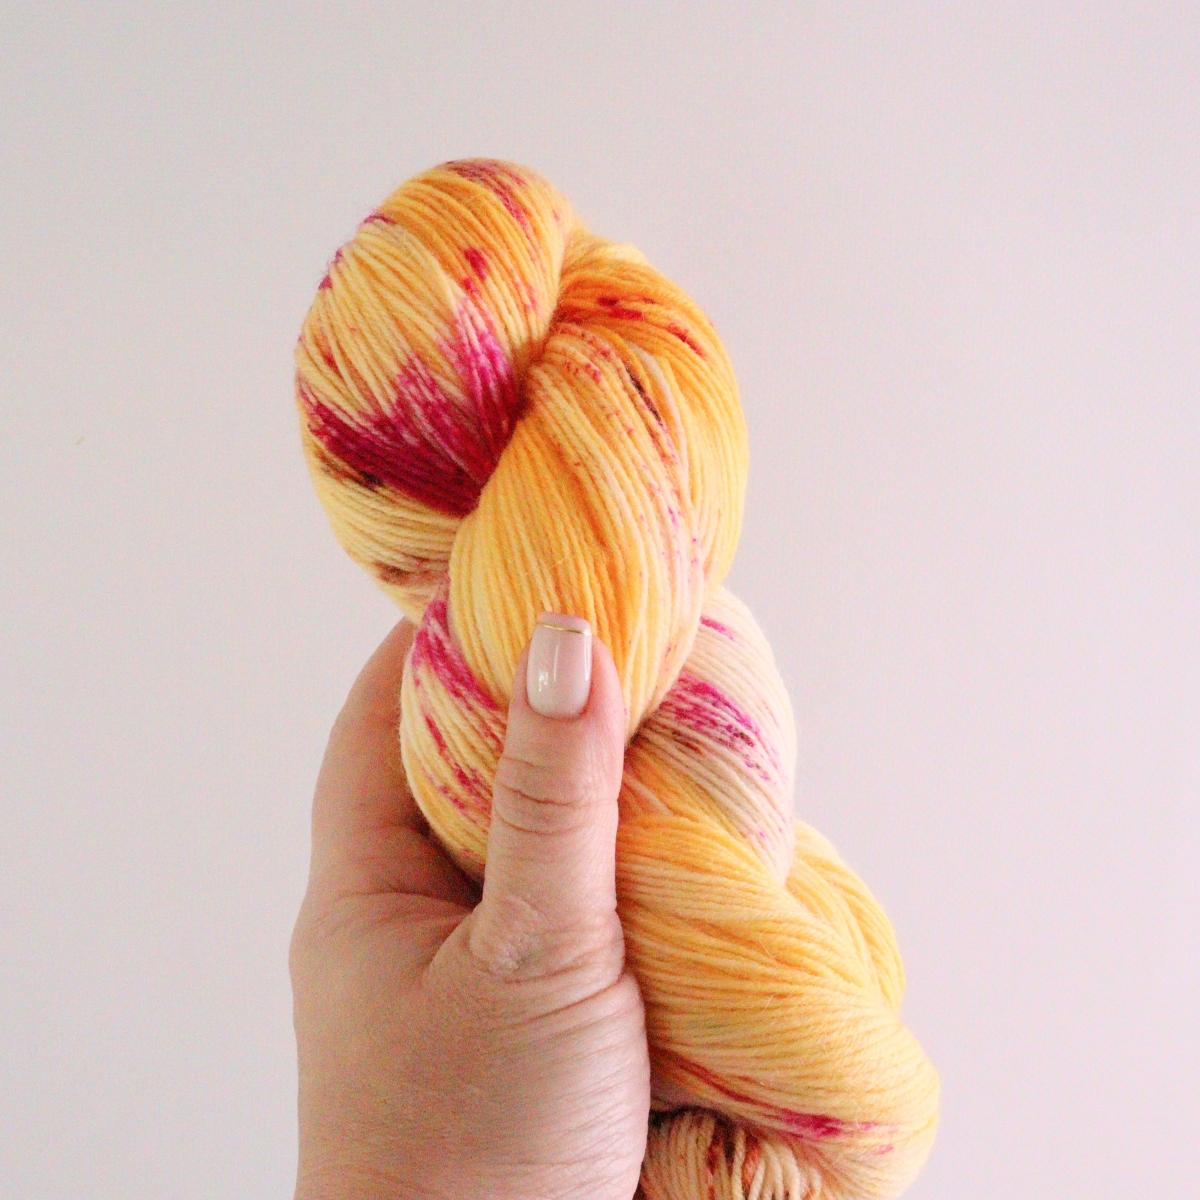 woodico.pro hand dyed yarn 077 2 1200x1200 - Hand dyed yarn / 077